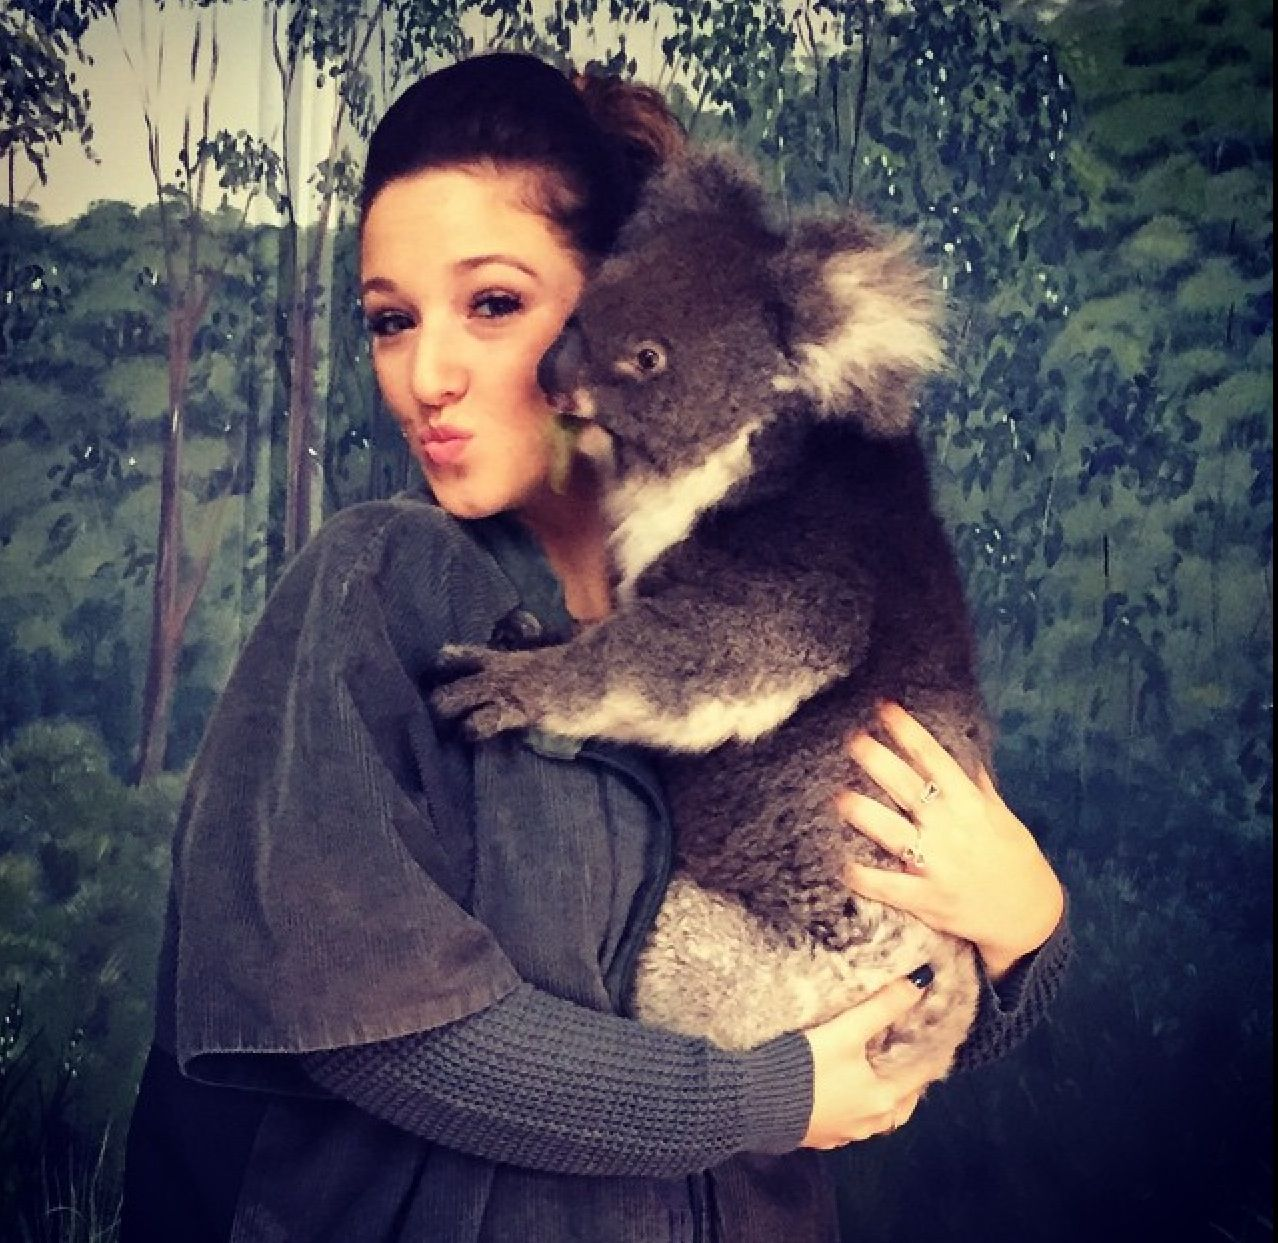 Gianna hugging a koala in Australia. | Koala, Koala bear ... - photo#12